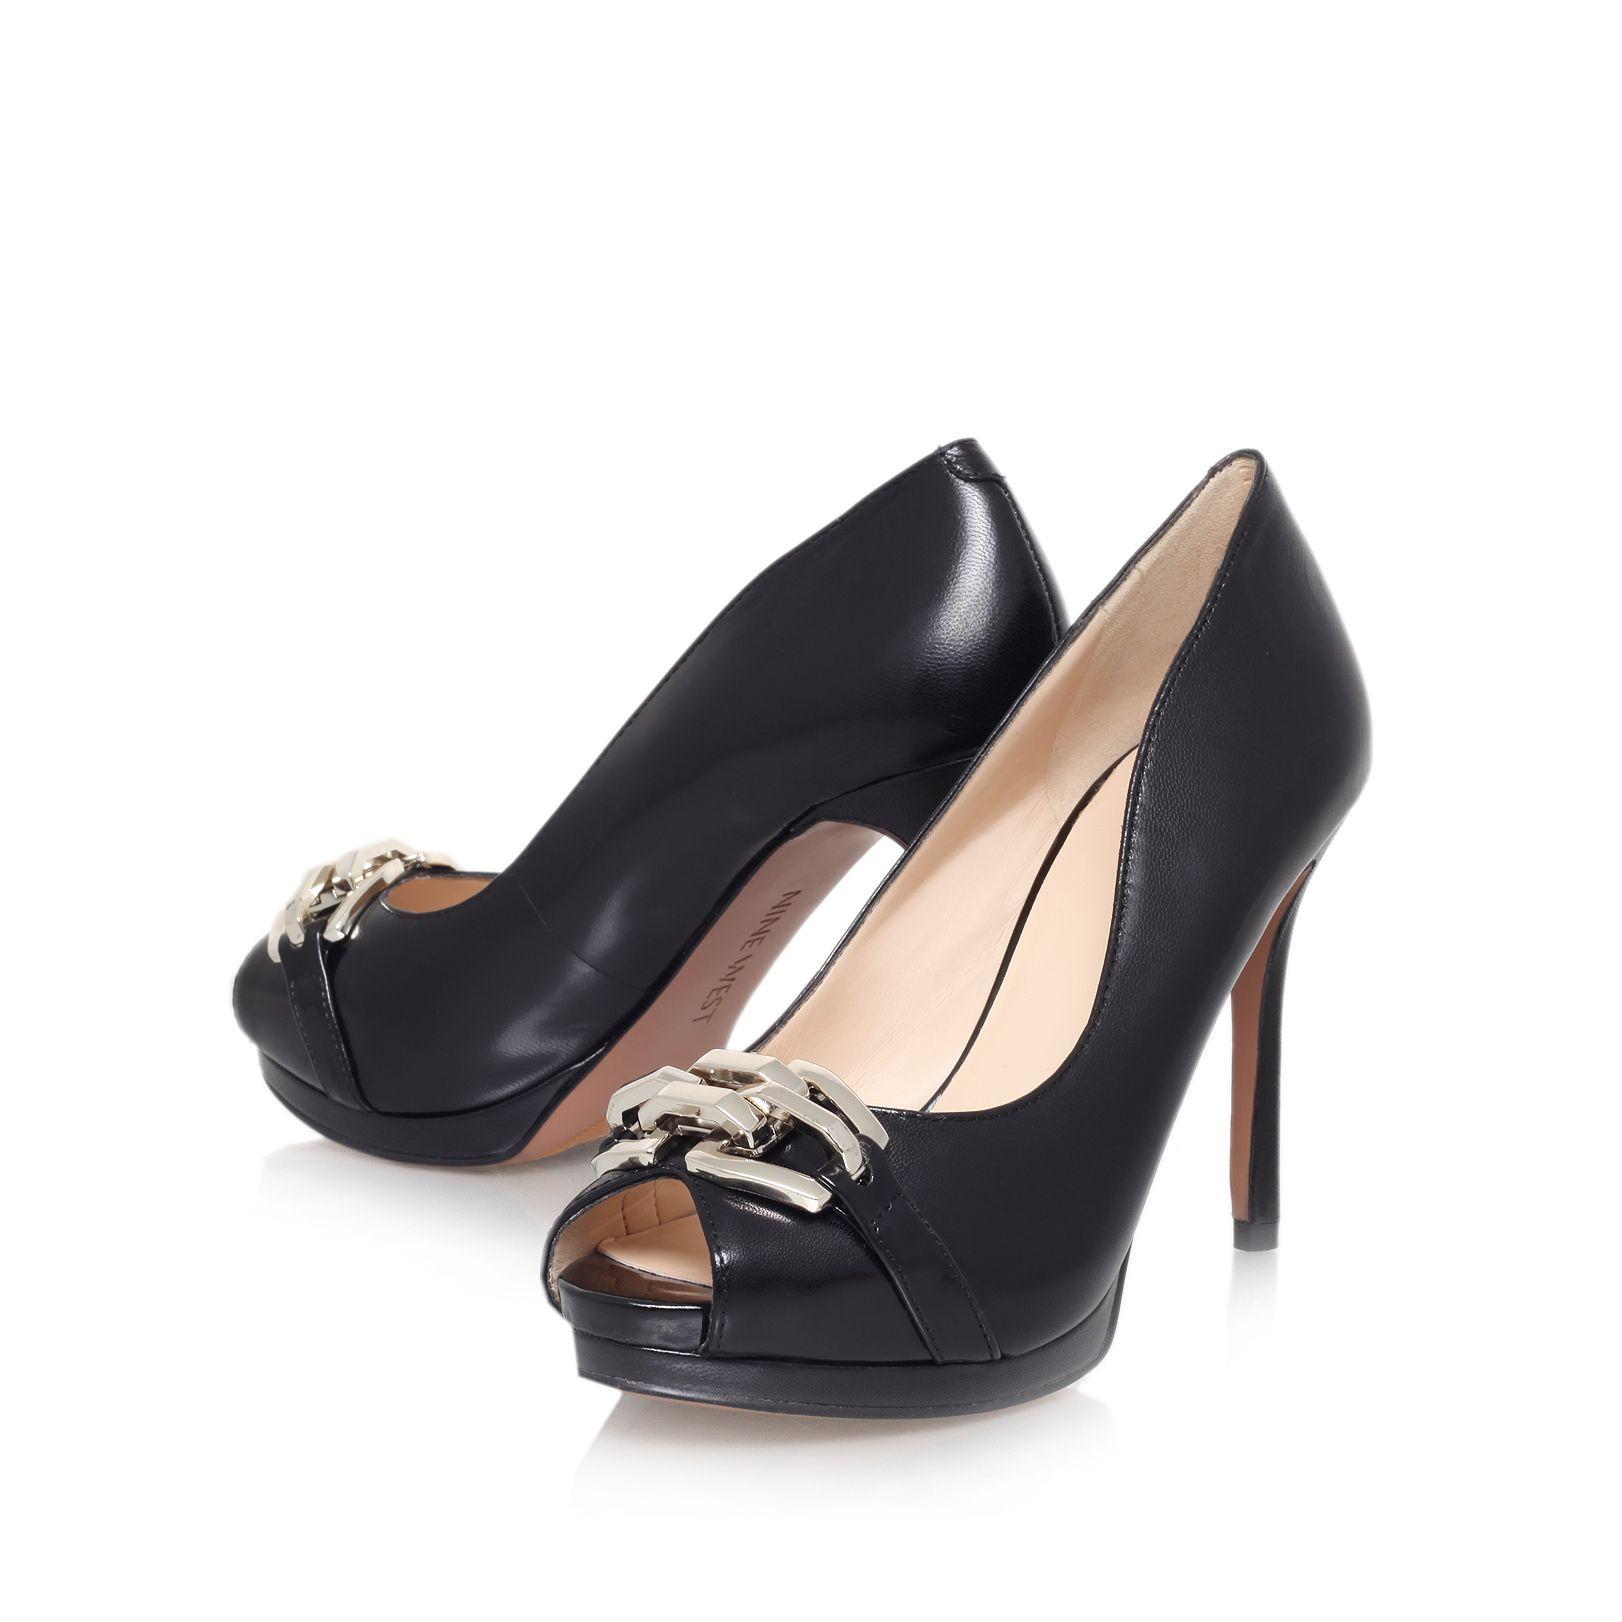 nine west finoula high heel peep toe court shoes in black